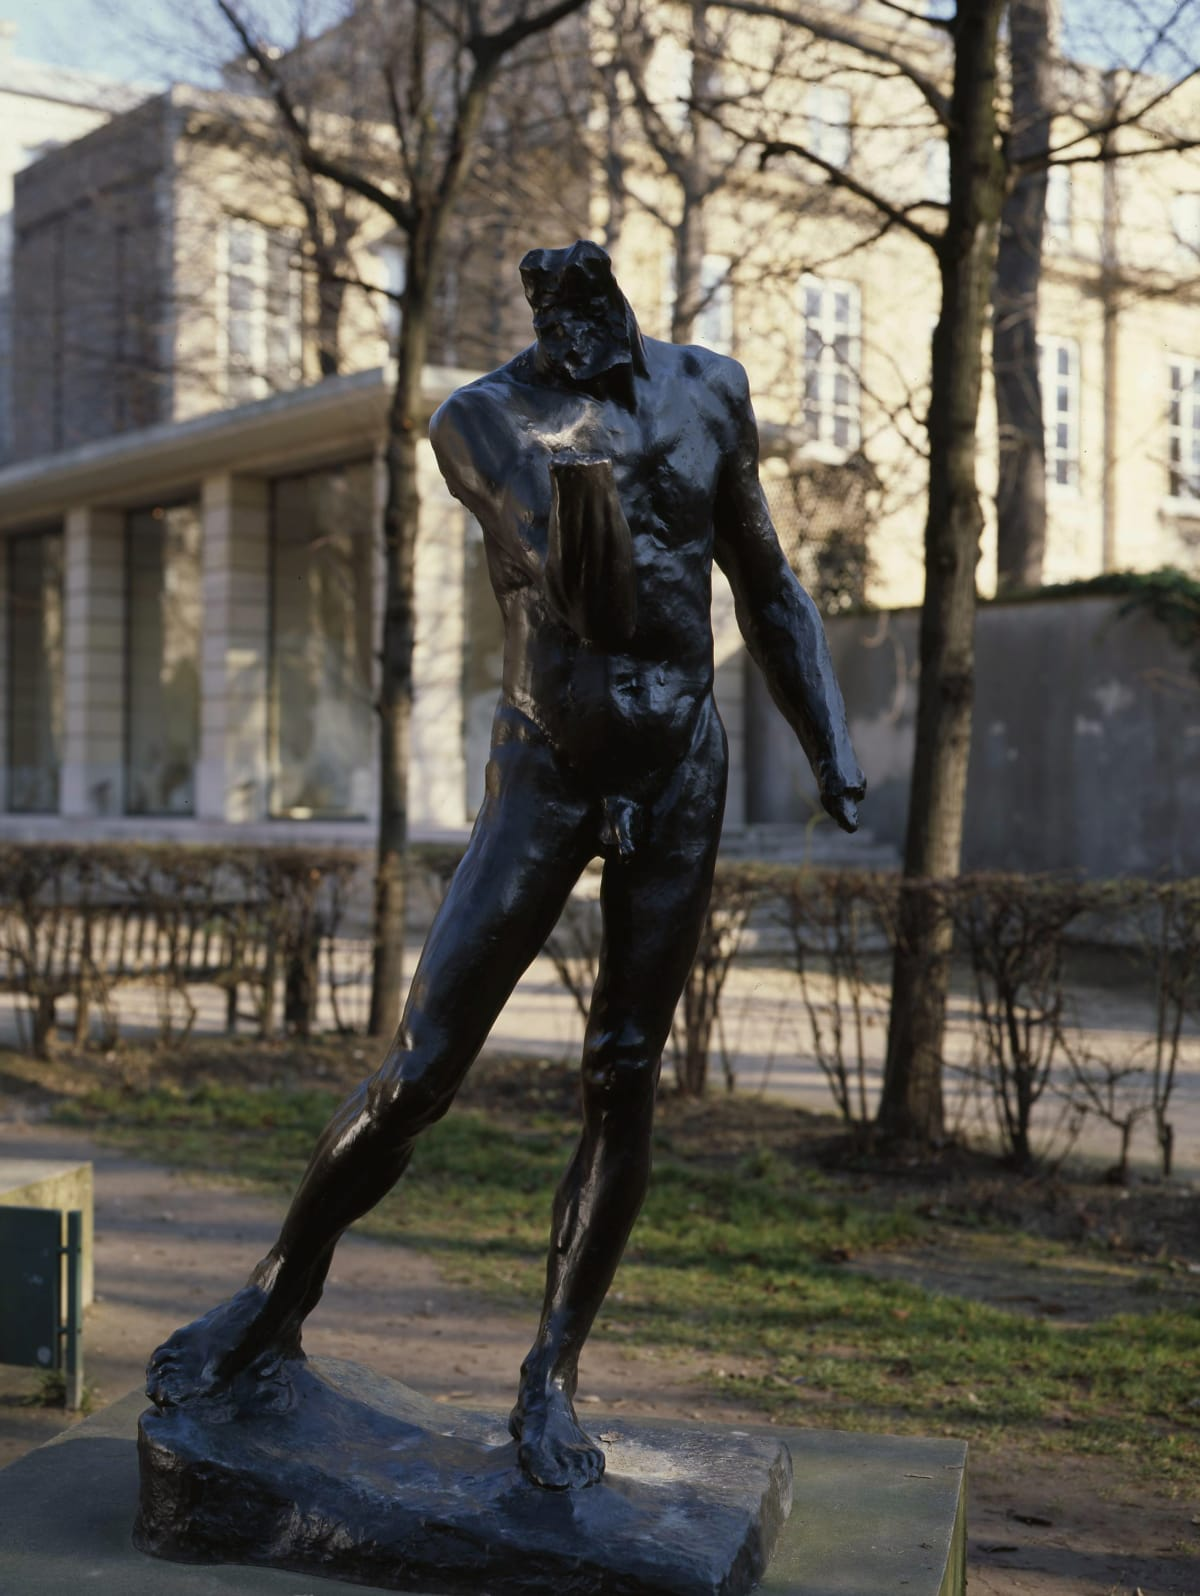 Pierre de Wissant by Auguste Rodin, Original Sculpture by the Artist at Coskun Fine Art